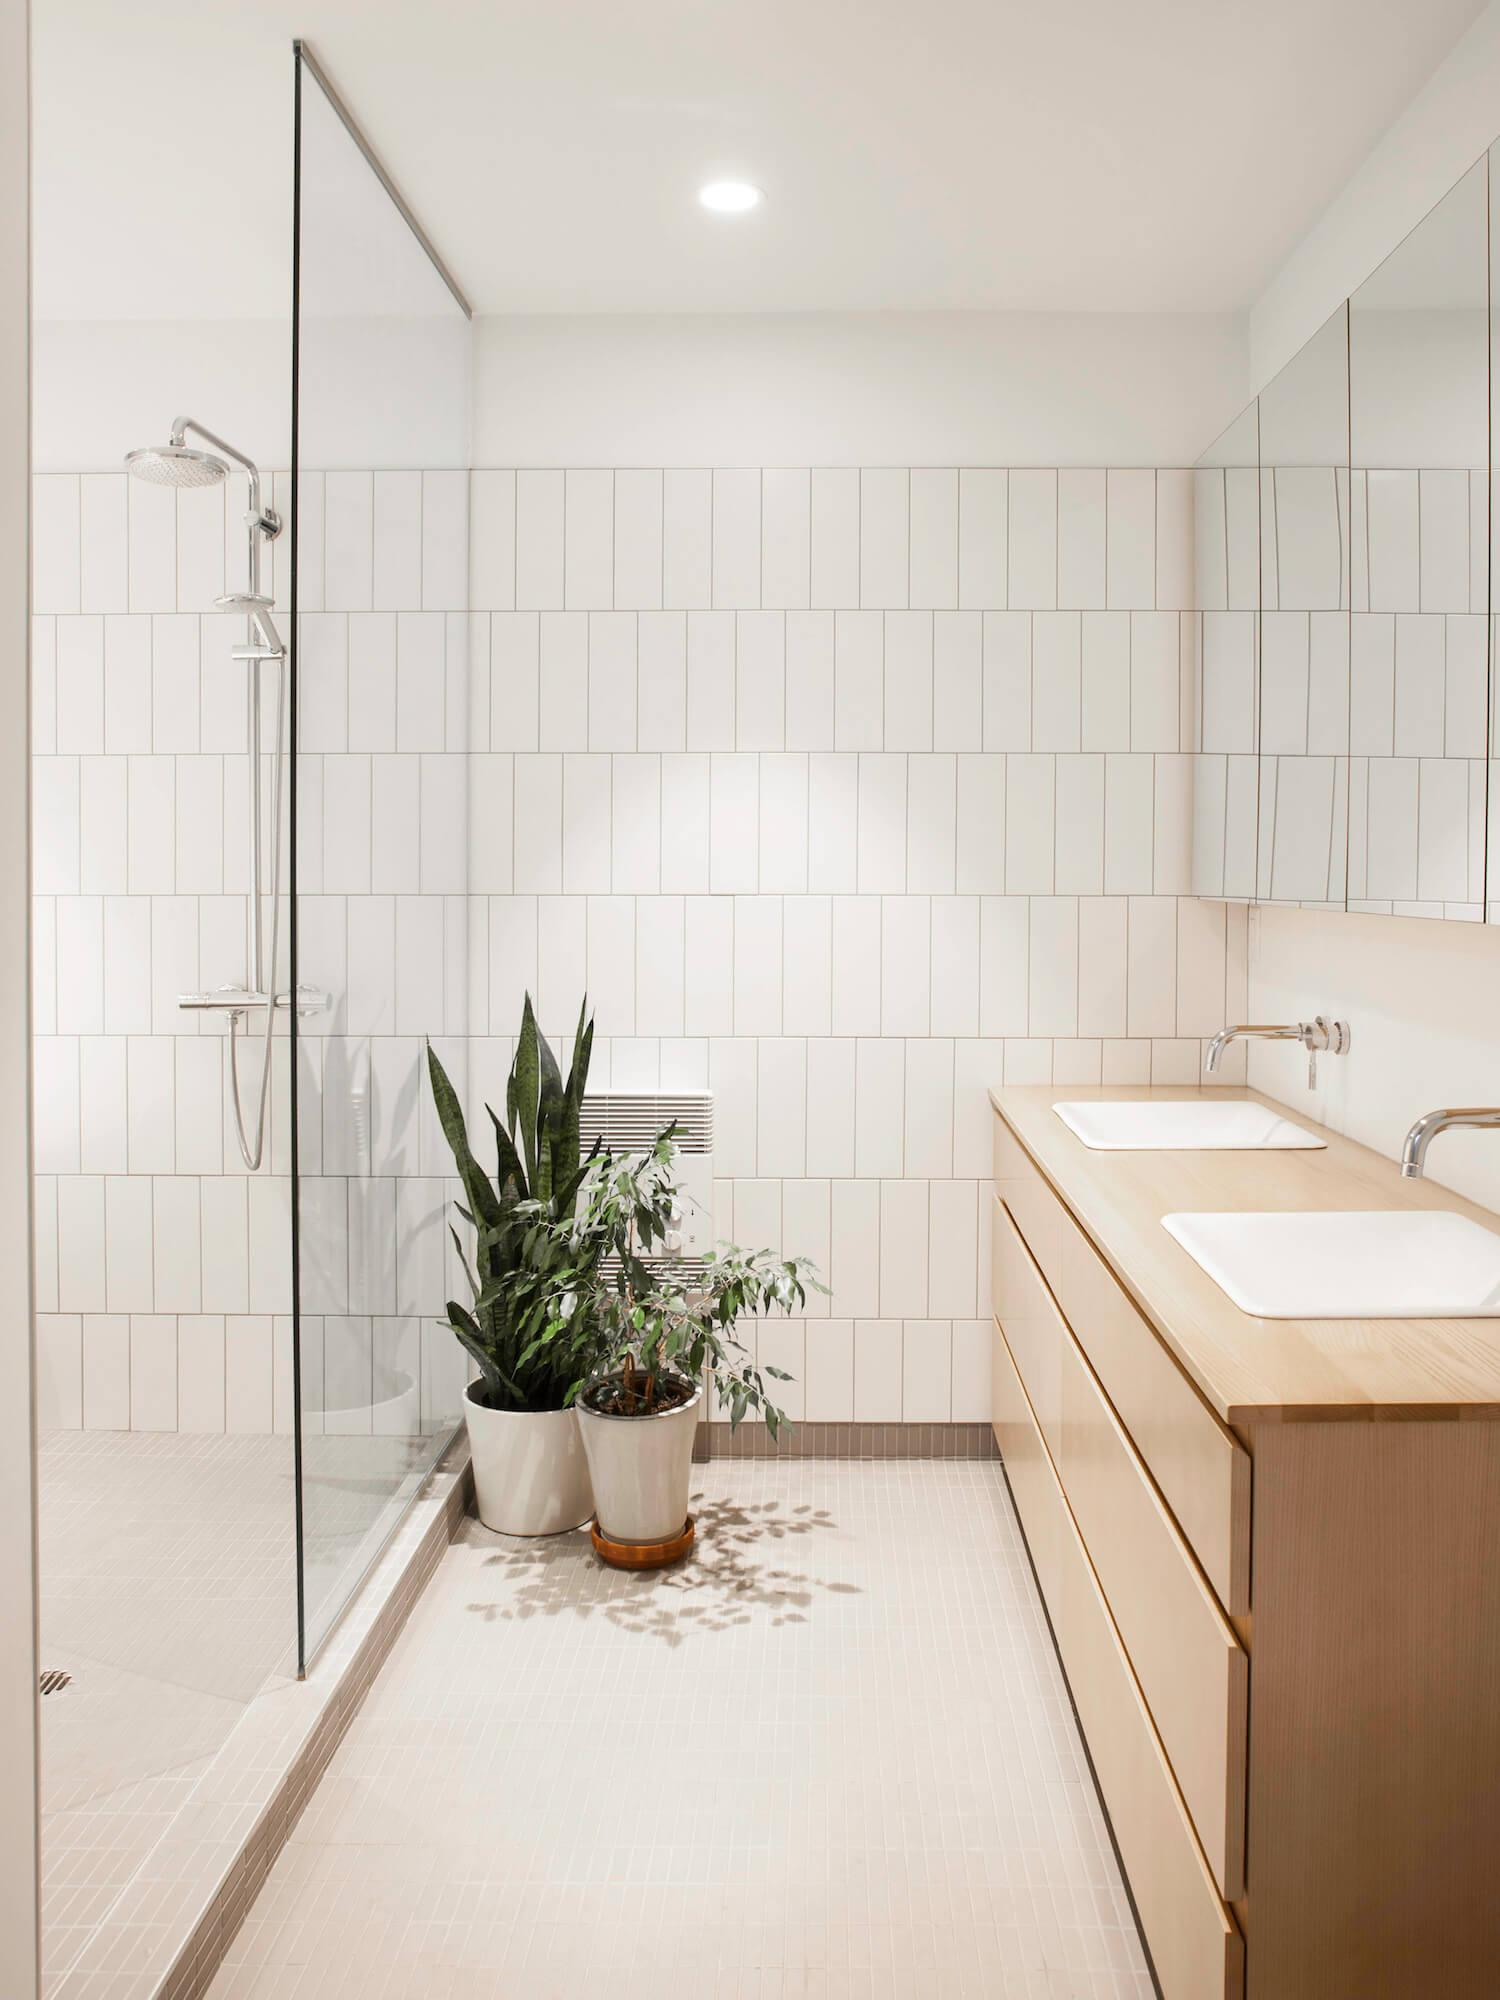 est living designer profile kim pariseau appareil architecture maison equinoxe 1